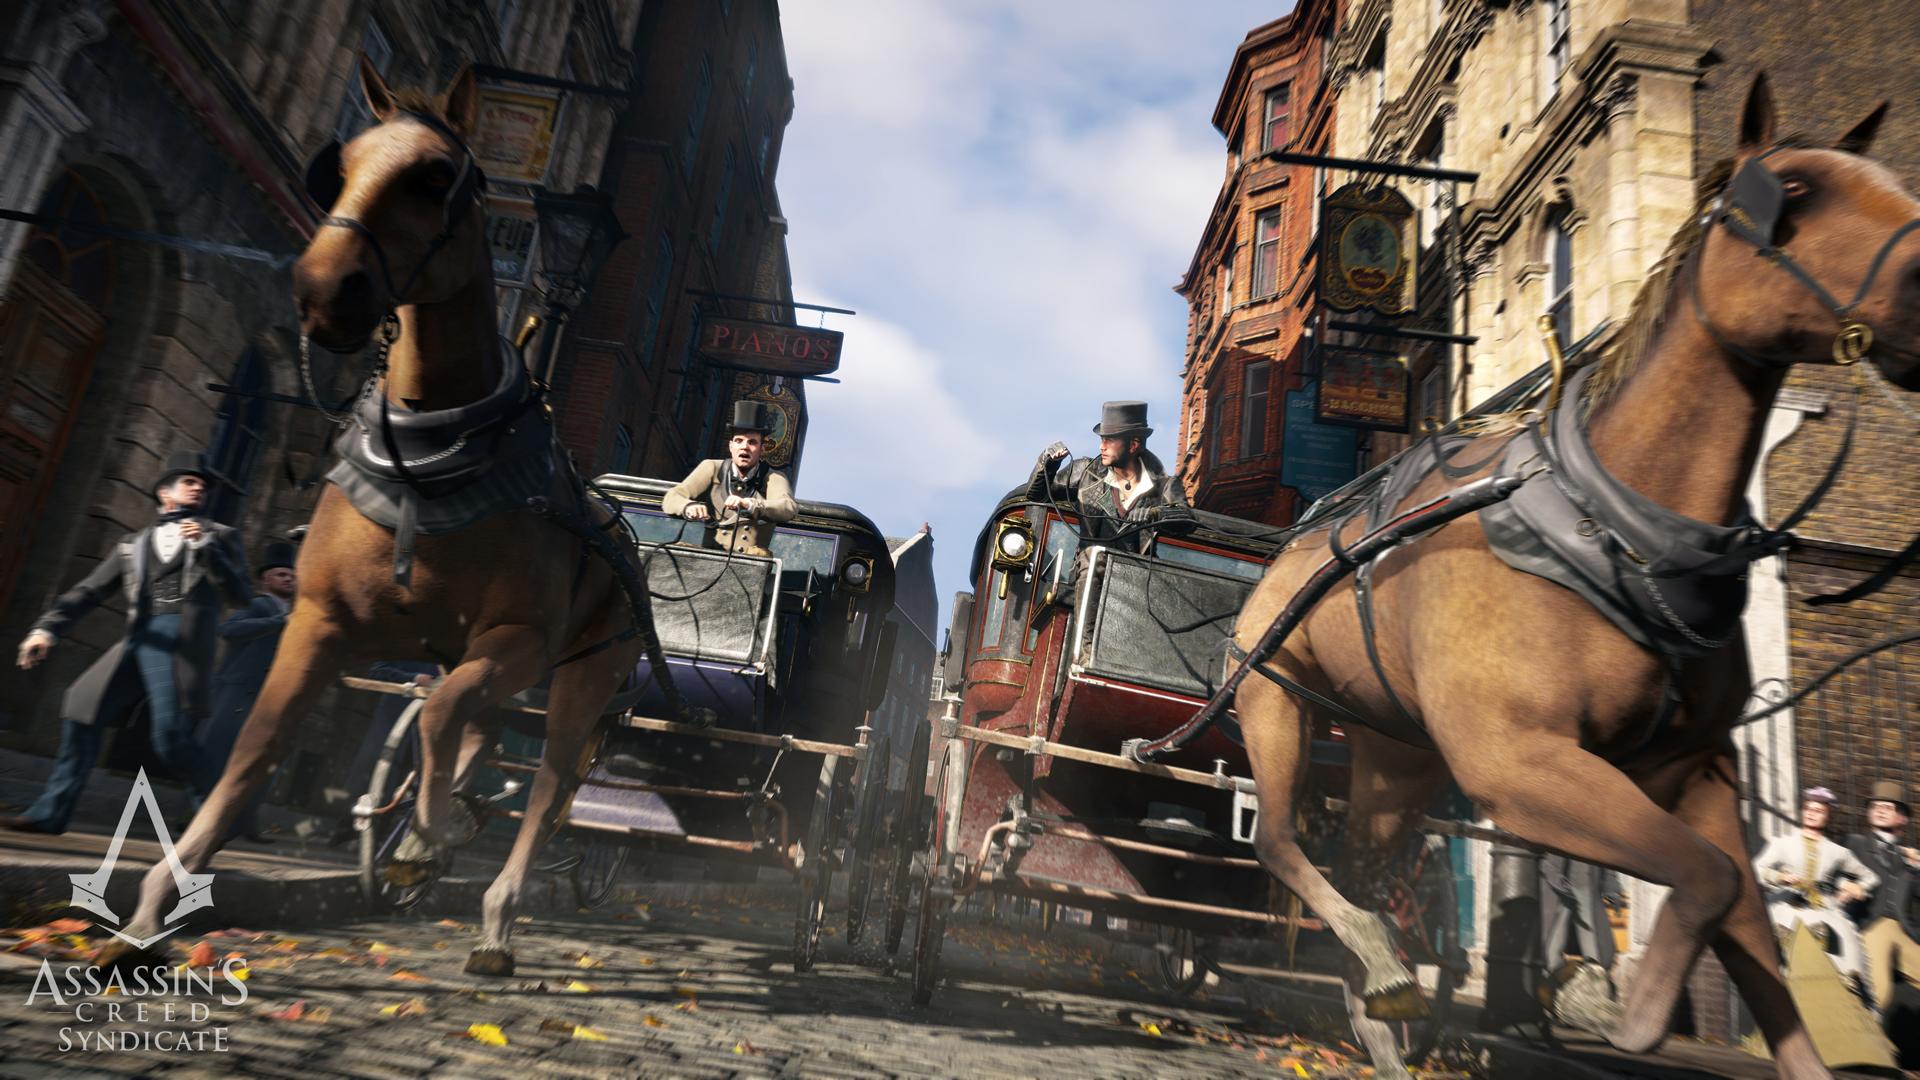 Assassin'S Creed Syndicate ESPAÑOL PC Full + Update v1.21 (CODEX) + REPACK 6 DVD5 (JPW) 5